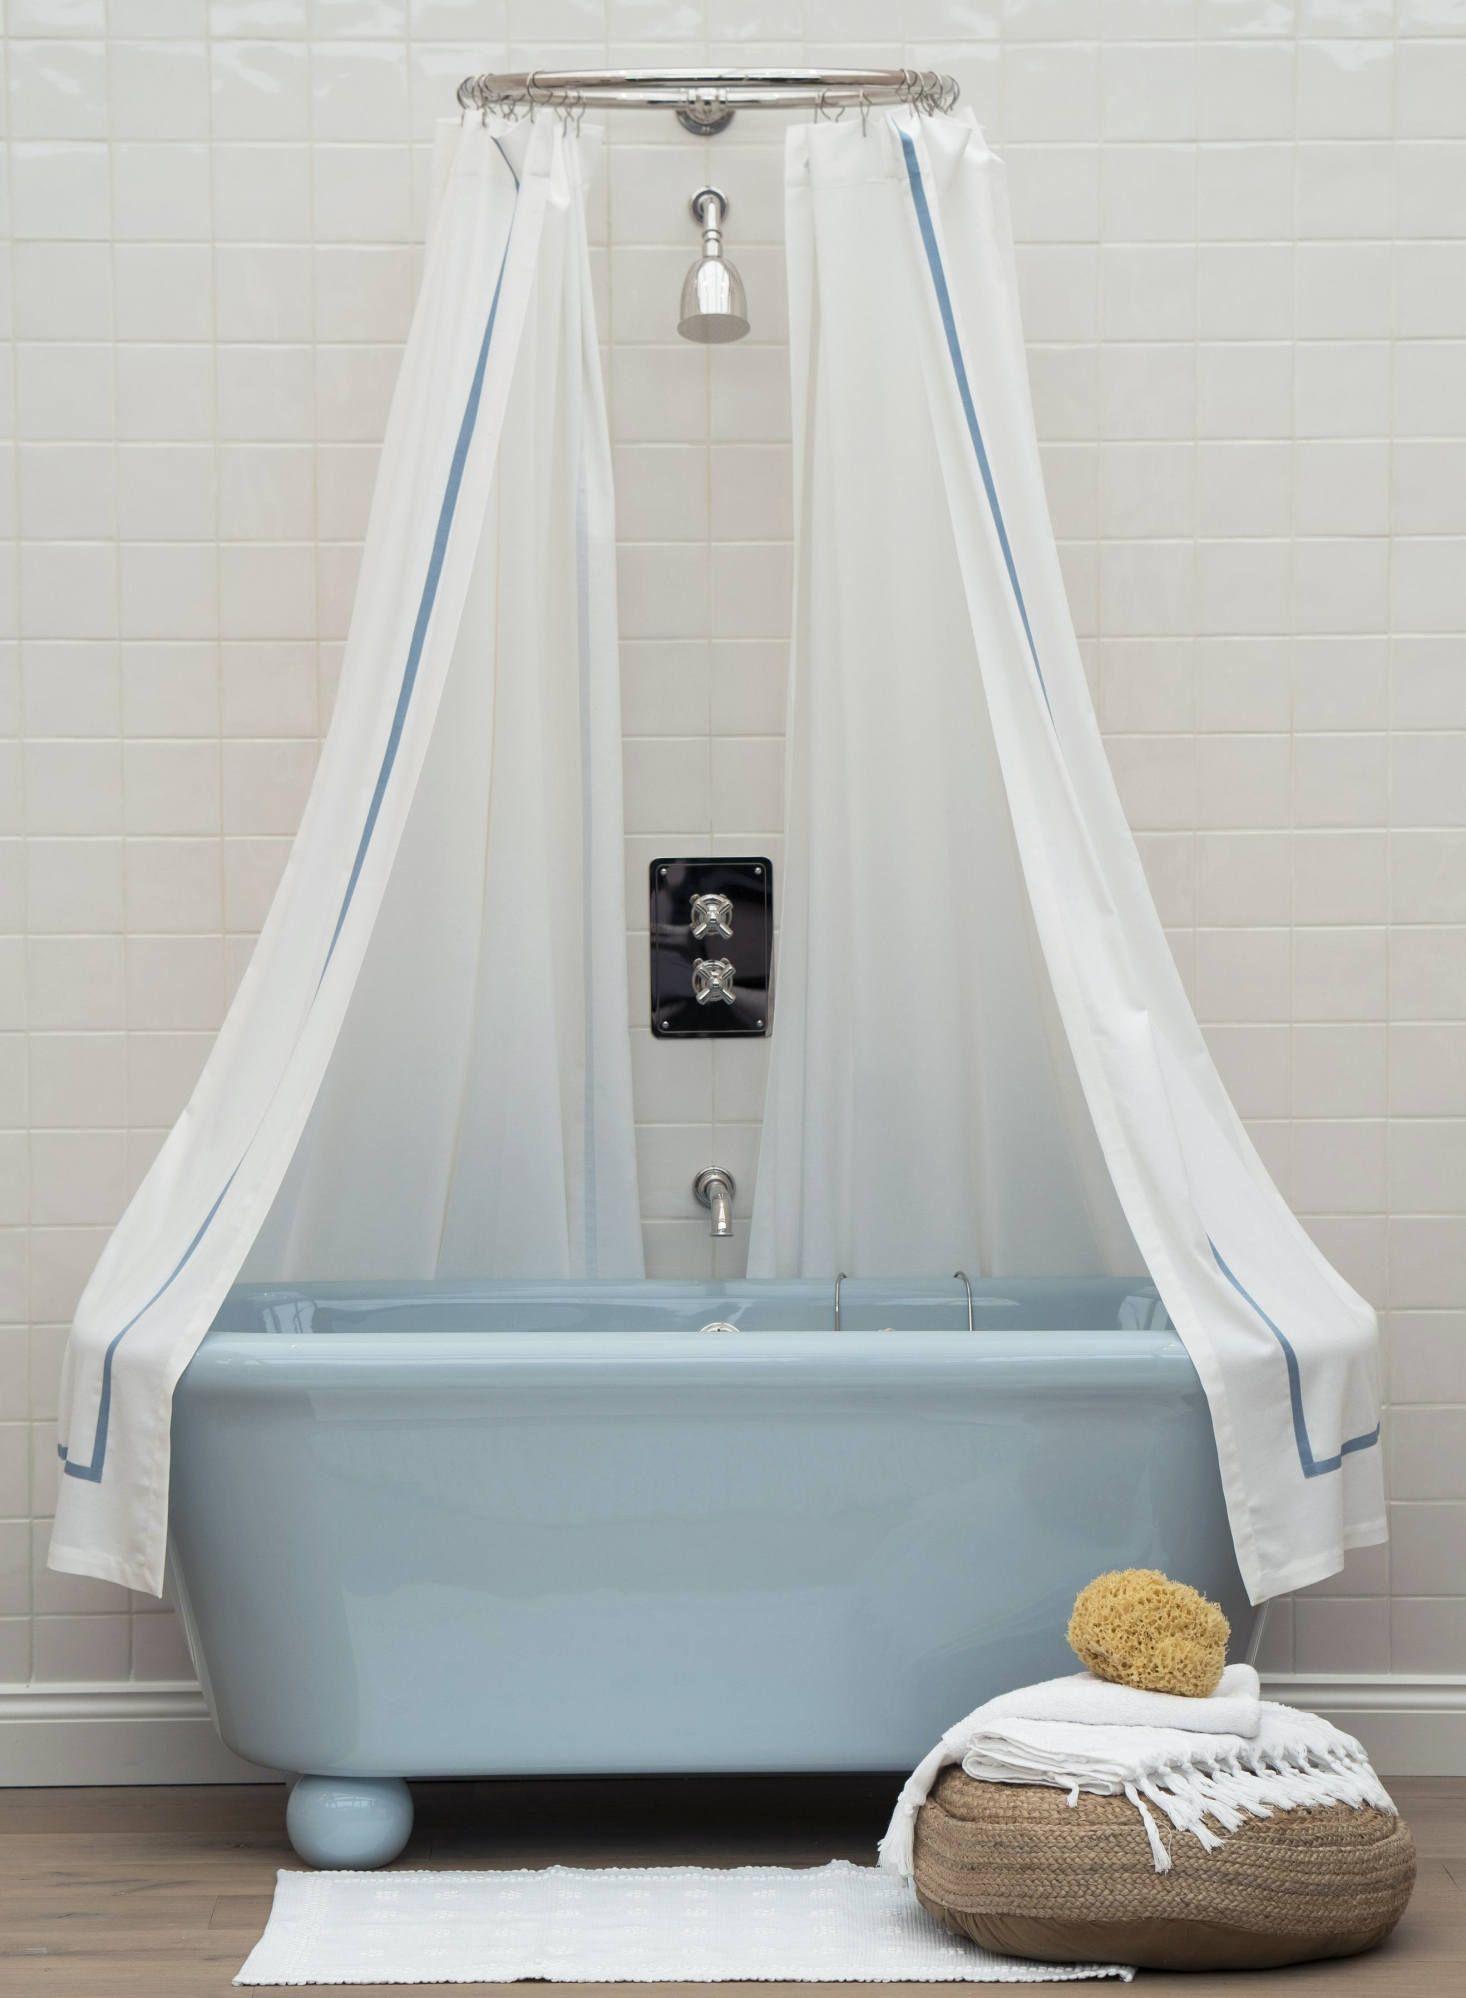 Retro Bath Fixtures In Retro Colors From The Water Monopoly Bath Fixtures Bedroom With Bath Retro Bathrooms